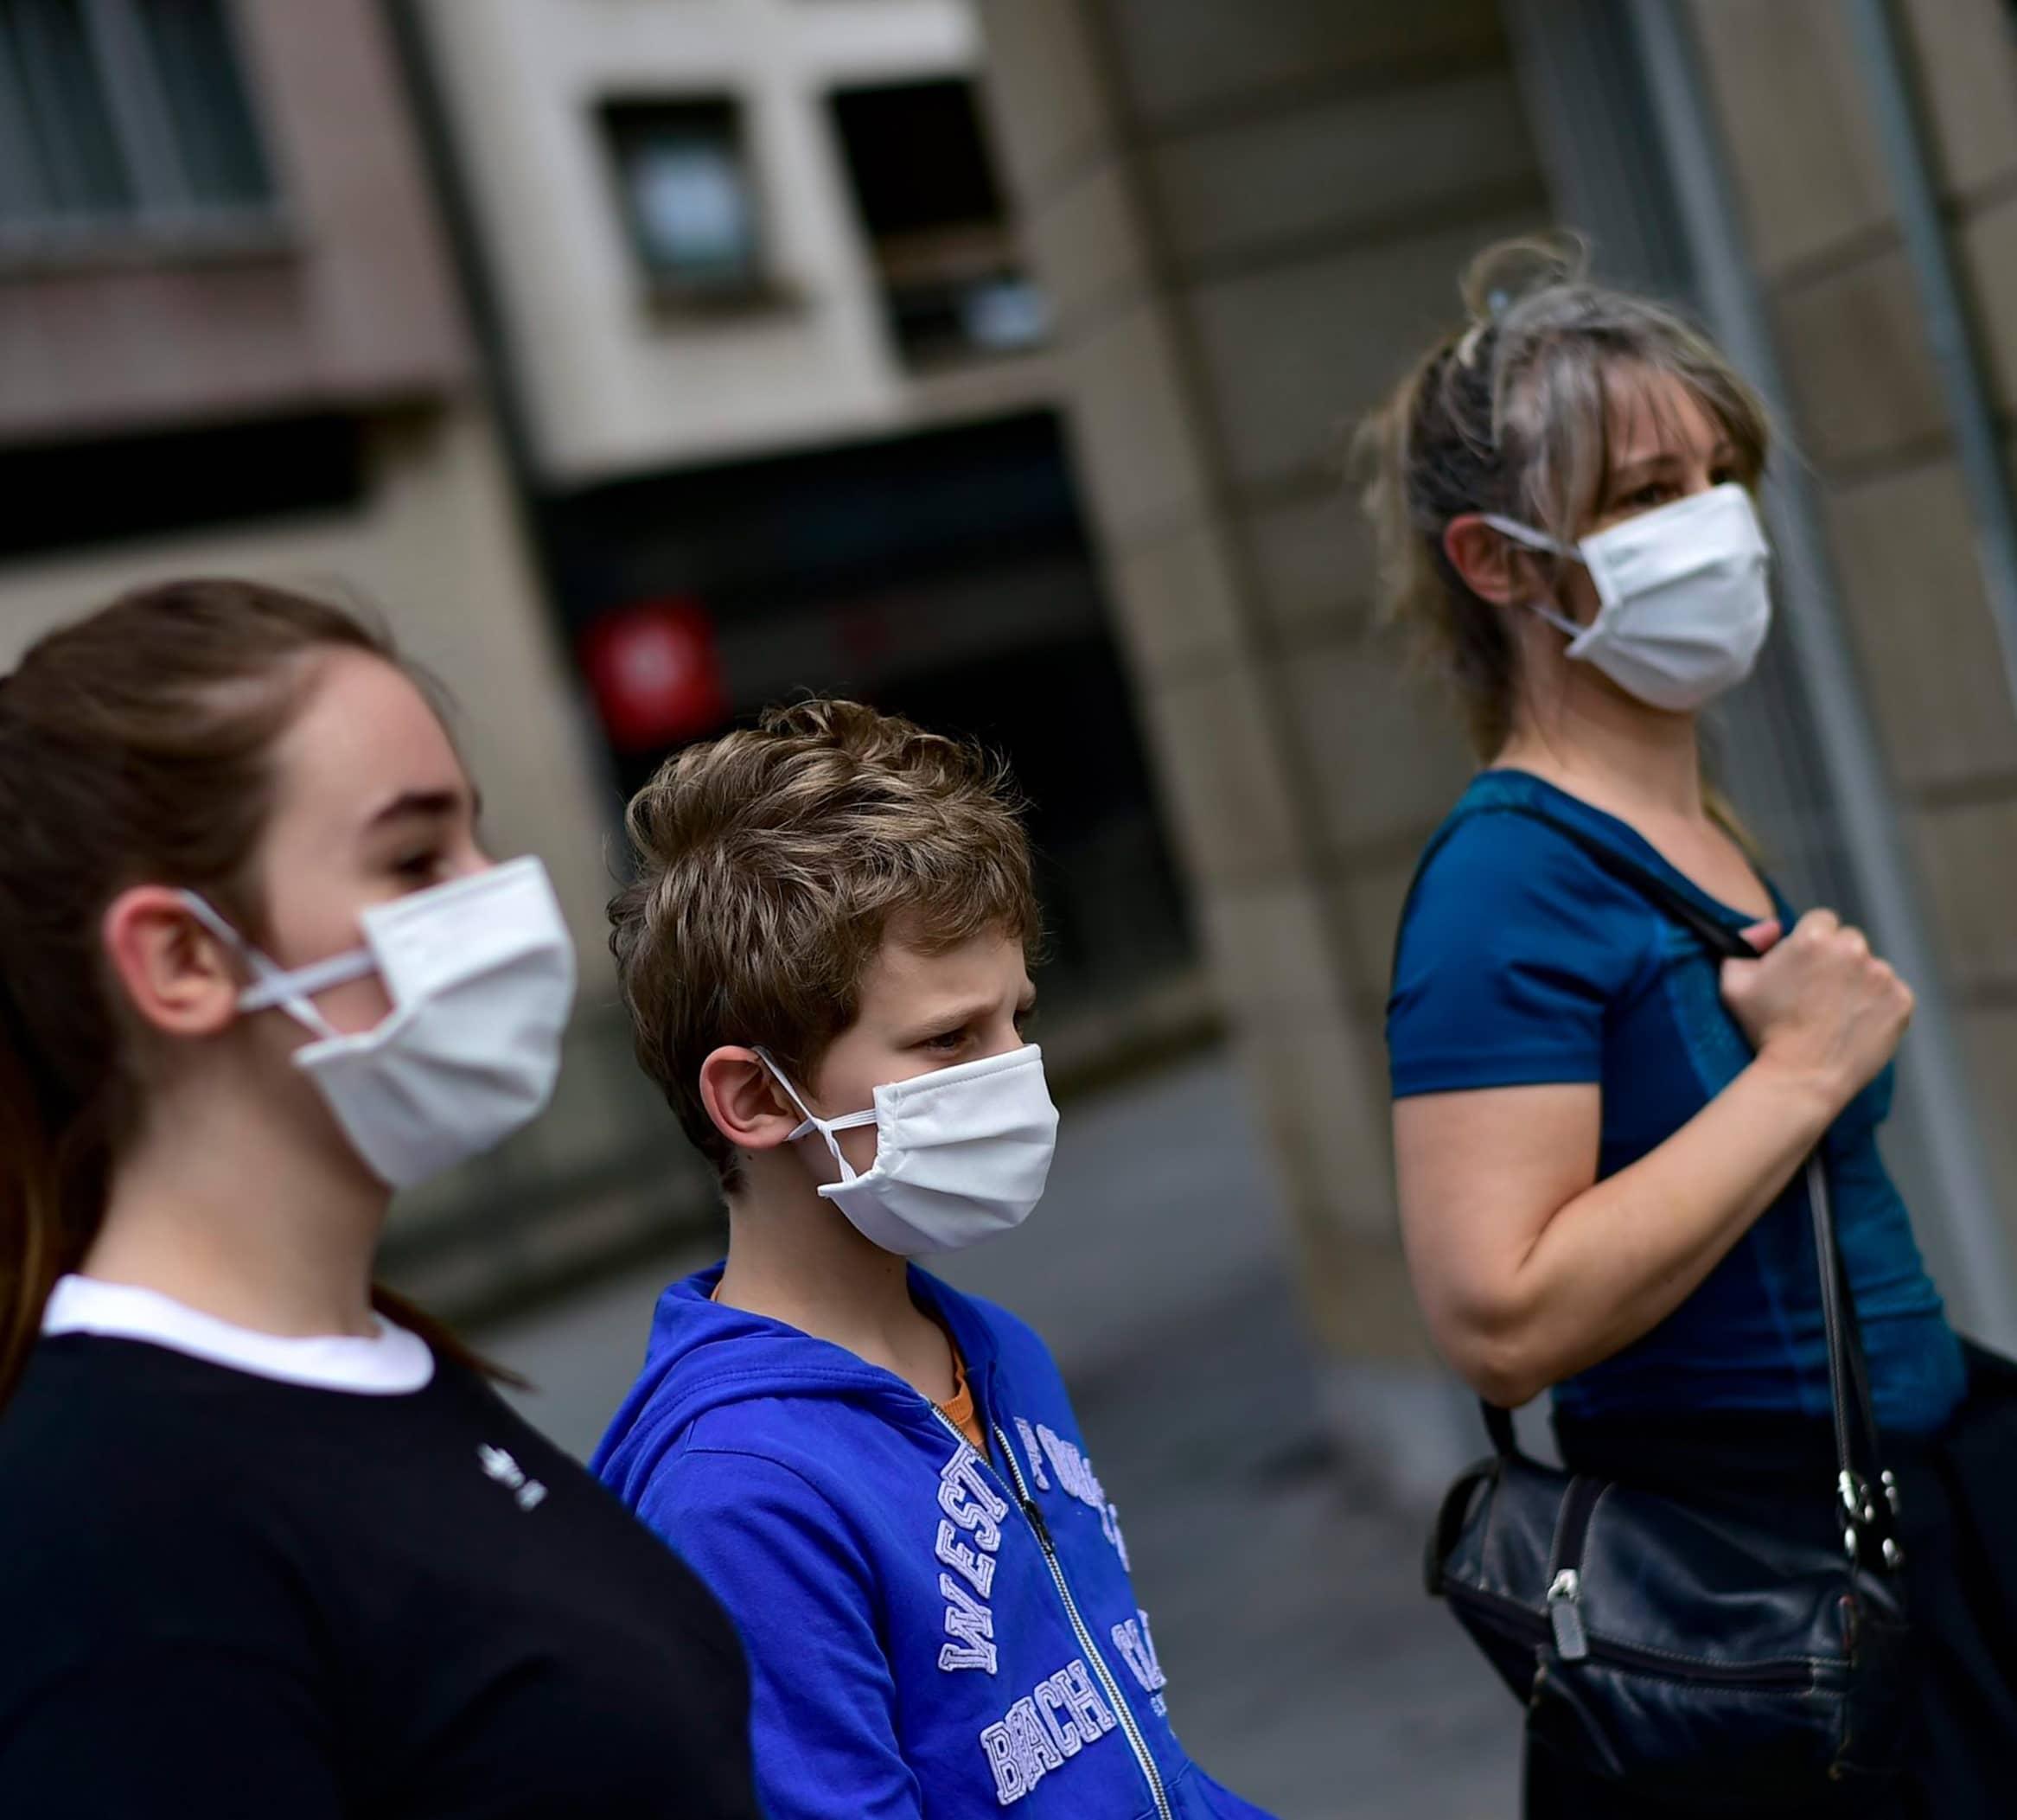 EUROPEAN DOCTORS WARN RARE KIDS' SYNDROME MAY HAVE VIRUS TIE